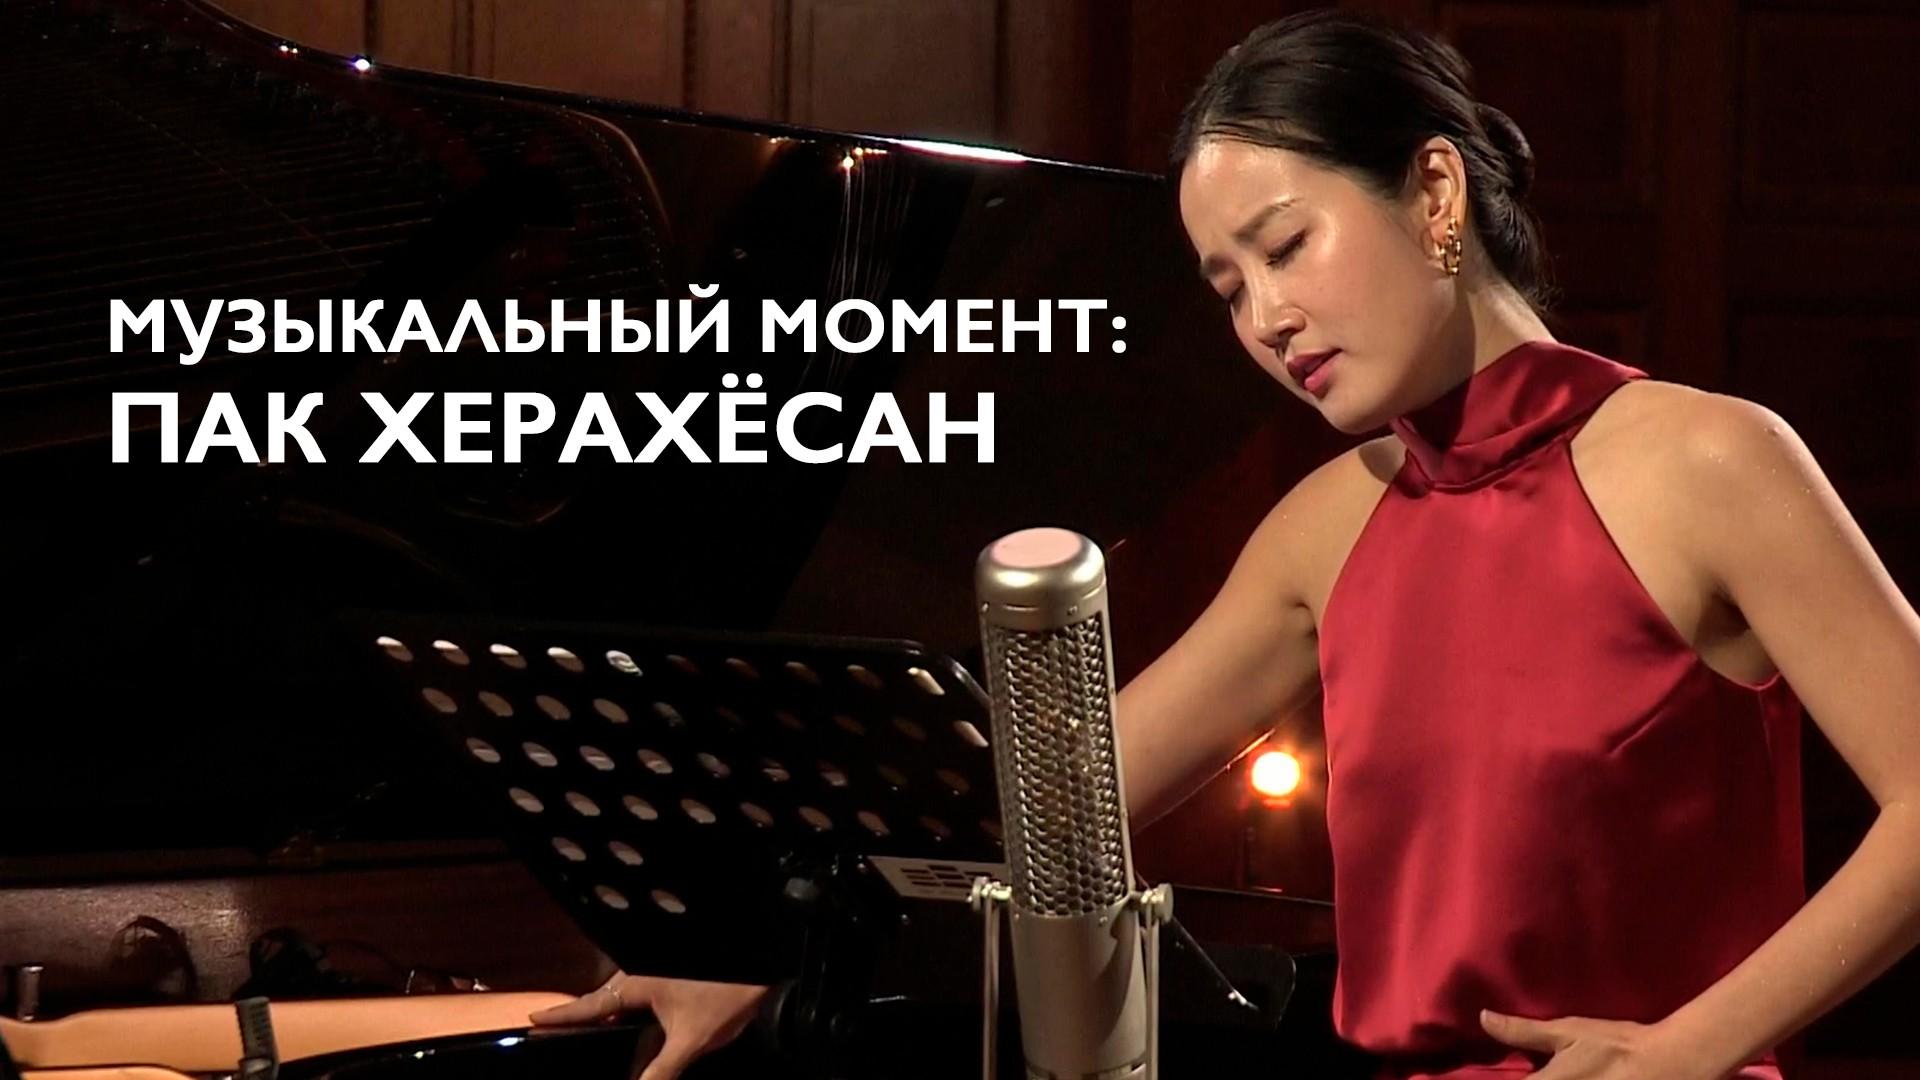 Музыкальный момент: Пак Херахёсан